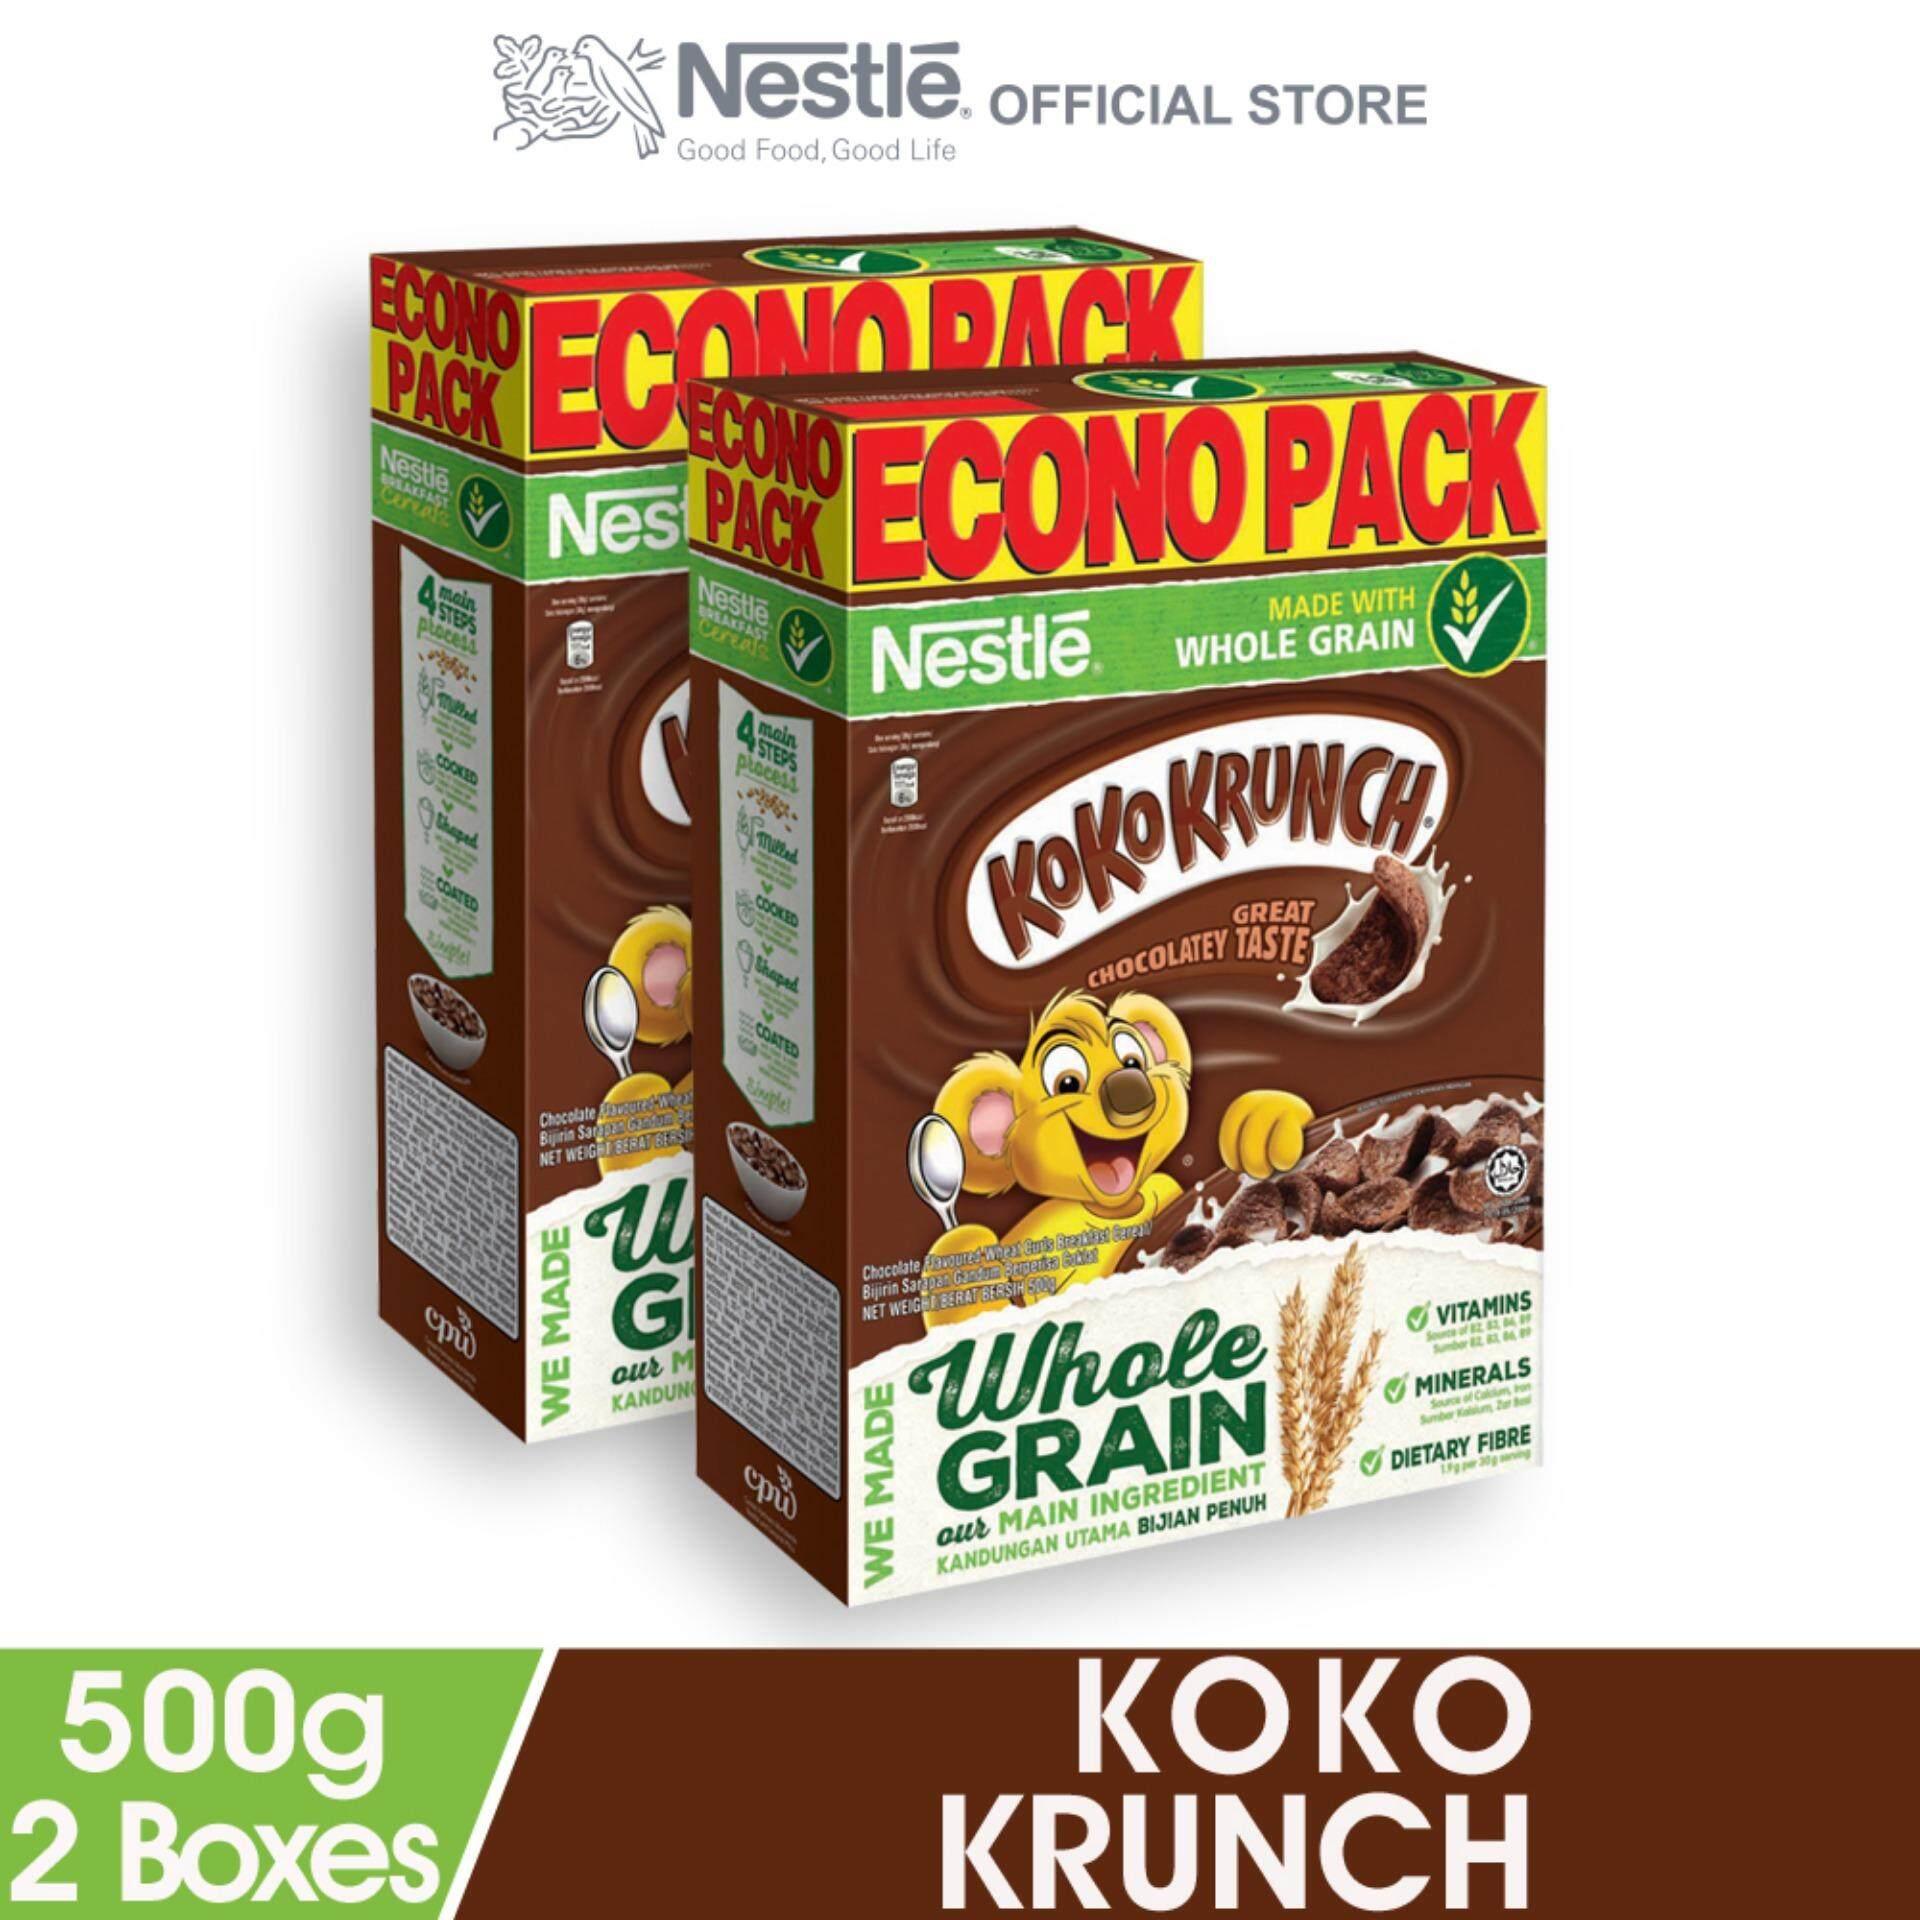 Nestle Koko Krunch Cerealeconopack 500g X2 Boxes By Nestle Flagship Store.